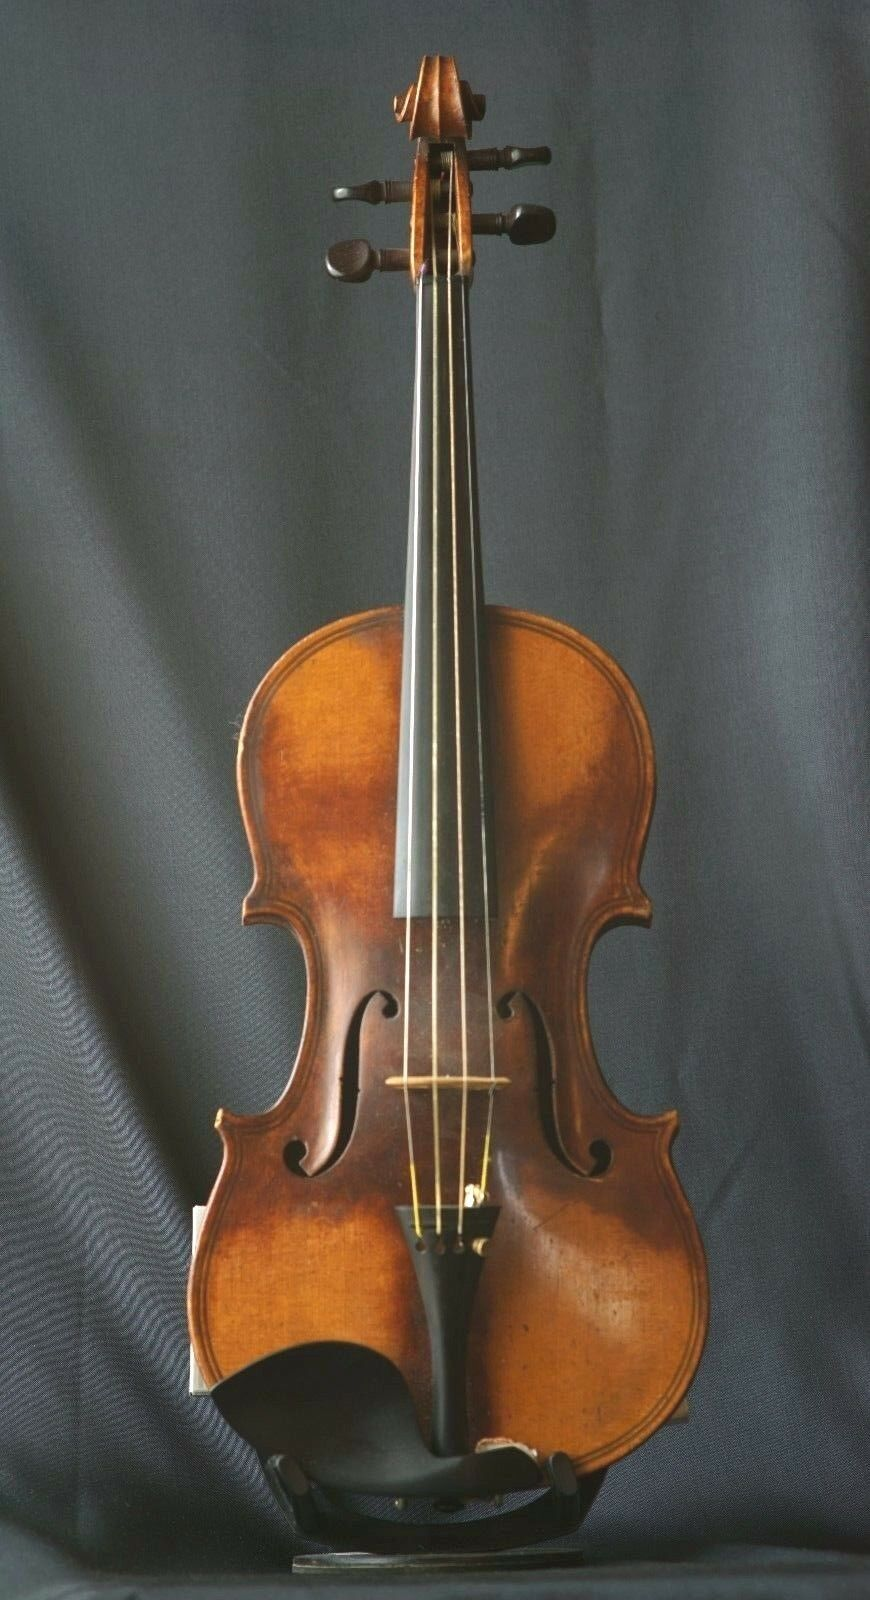 Old Violino violin antico francese France 4 4  Feyen anno 1855 ottimo stato